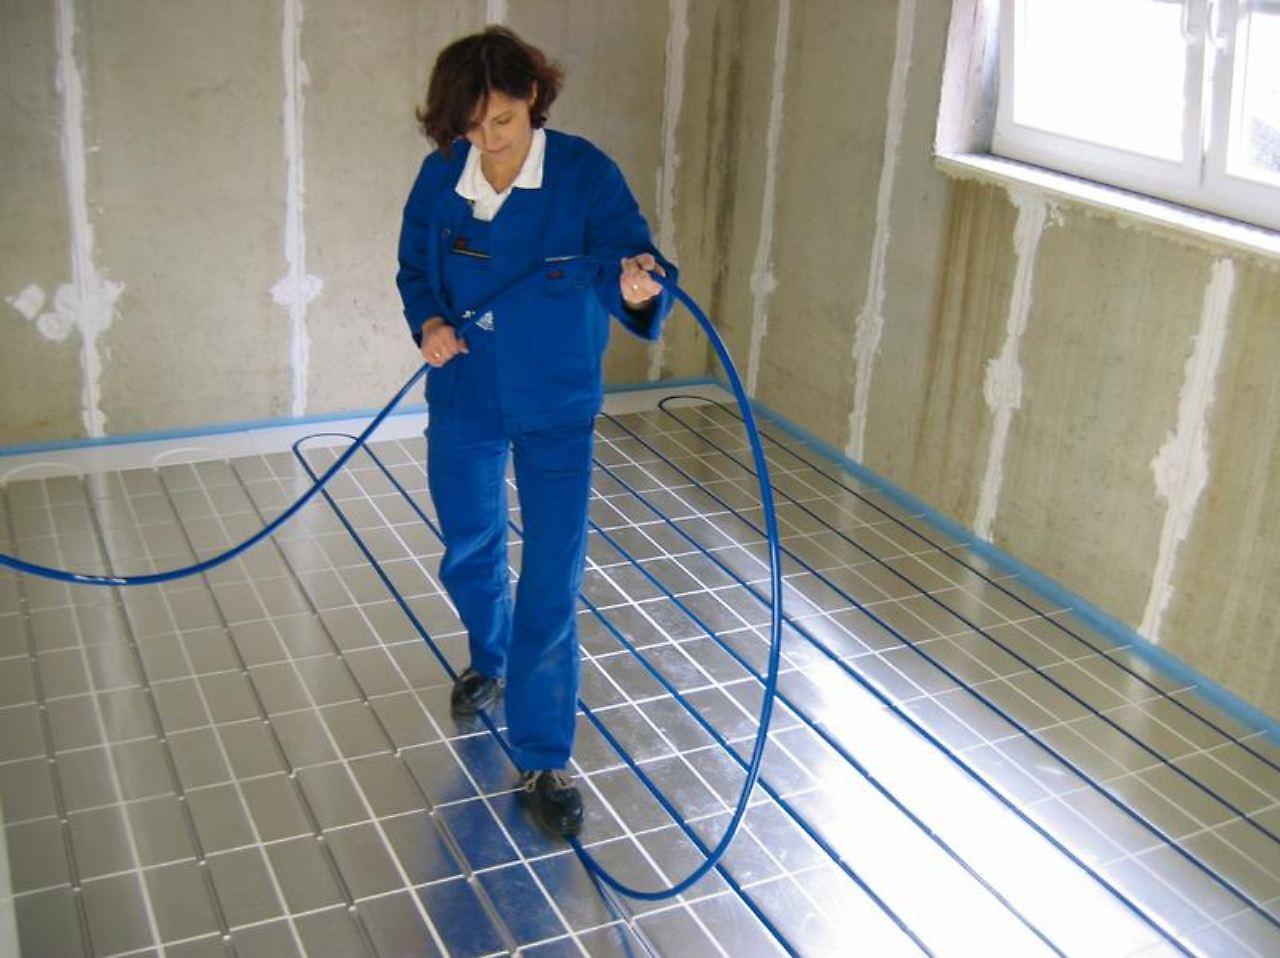 Moderne Heizsysteme fußbodenheizung warme füße wenige kosten n tv de